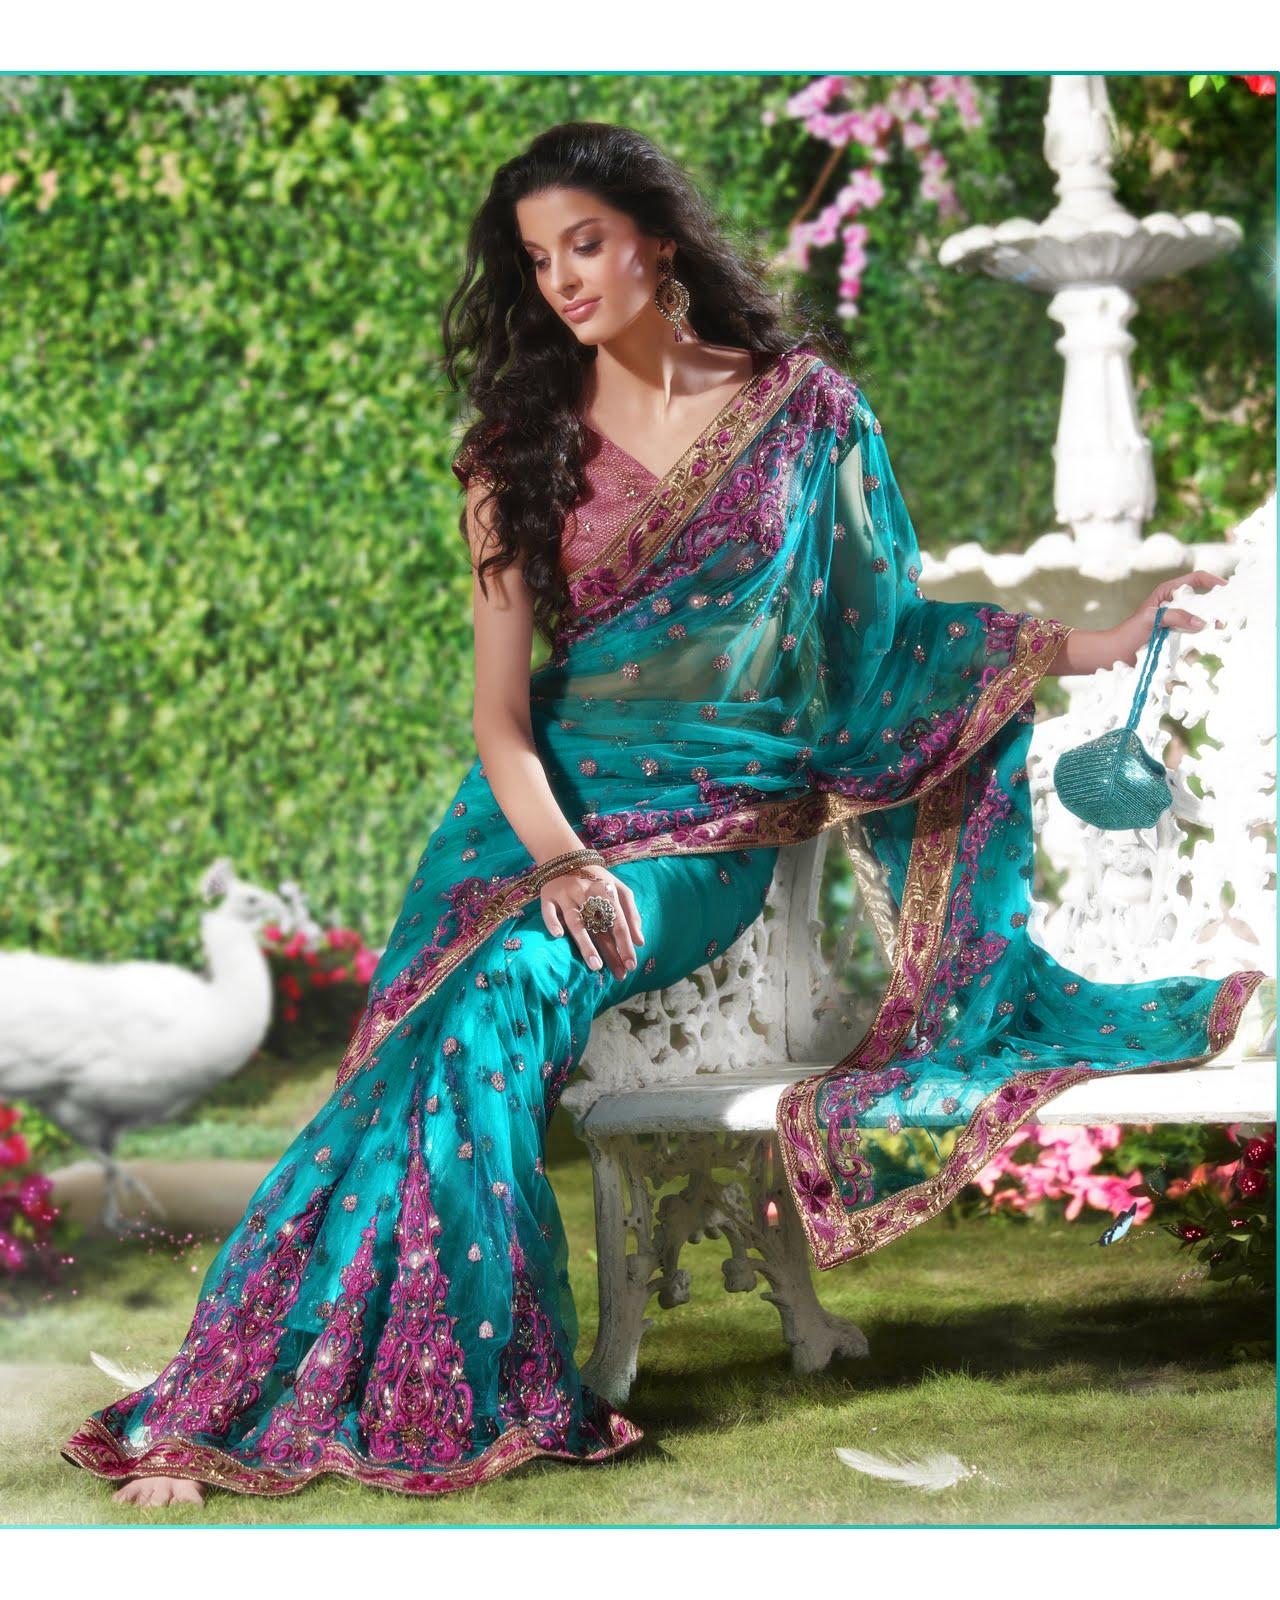 Priyanka Chopra Home Products Celebrity Lengha Princess Lengha 640 X